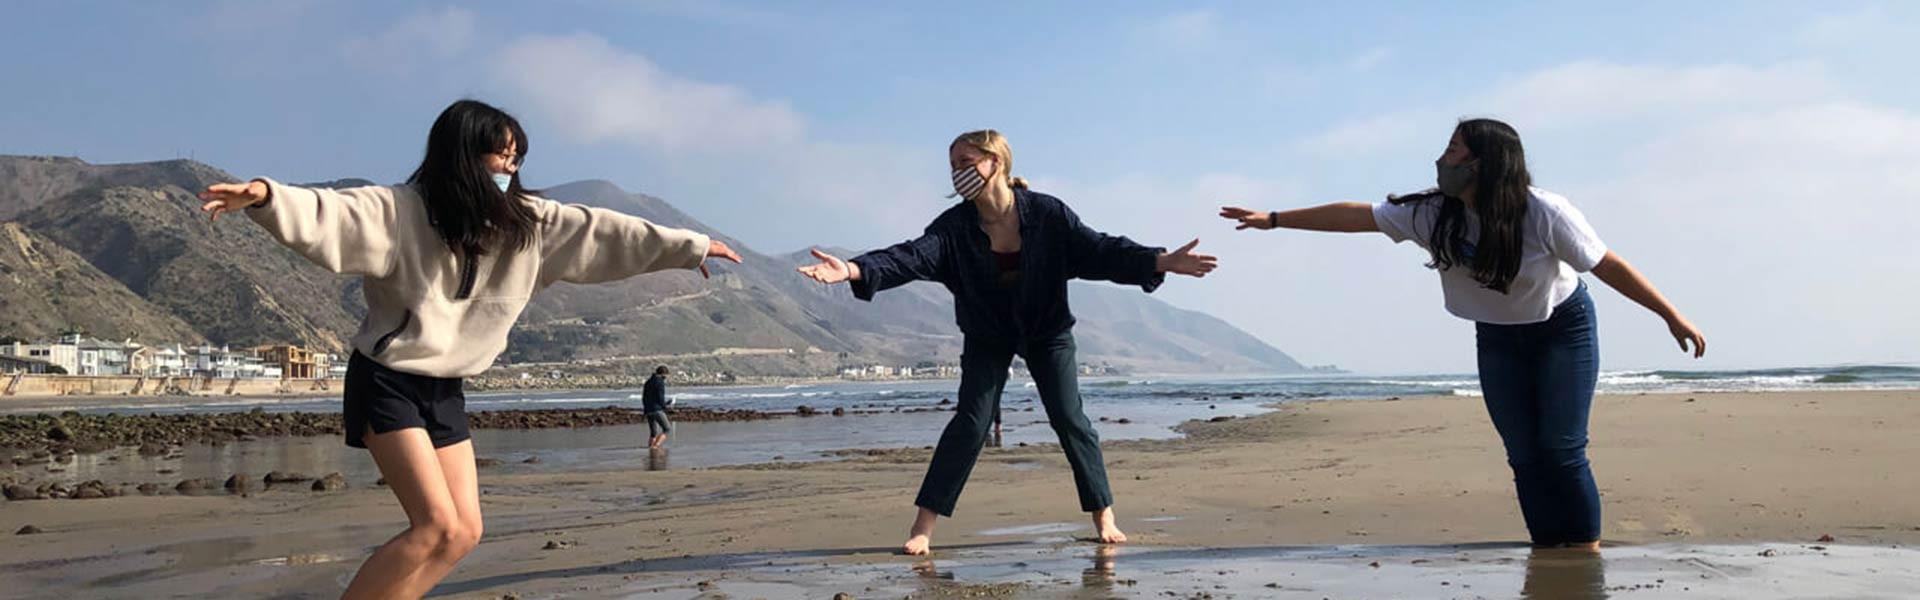 students having fun on campus at Ojai Valley School in California